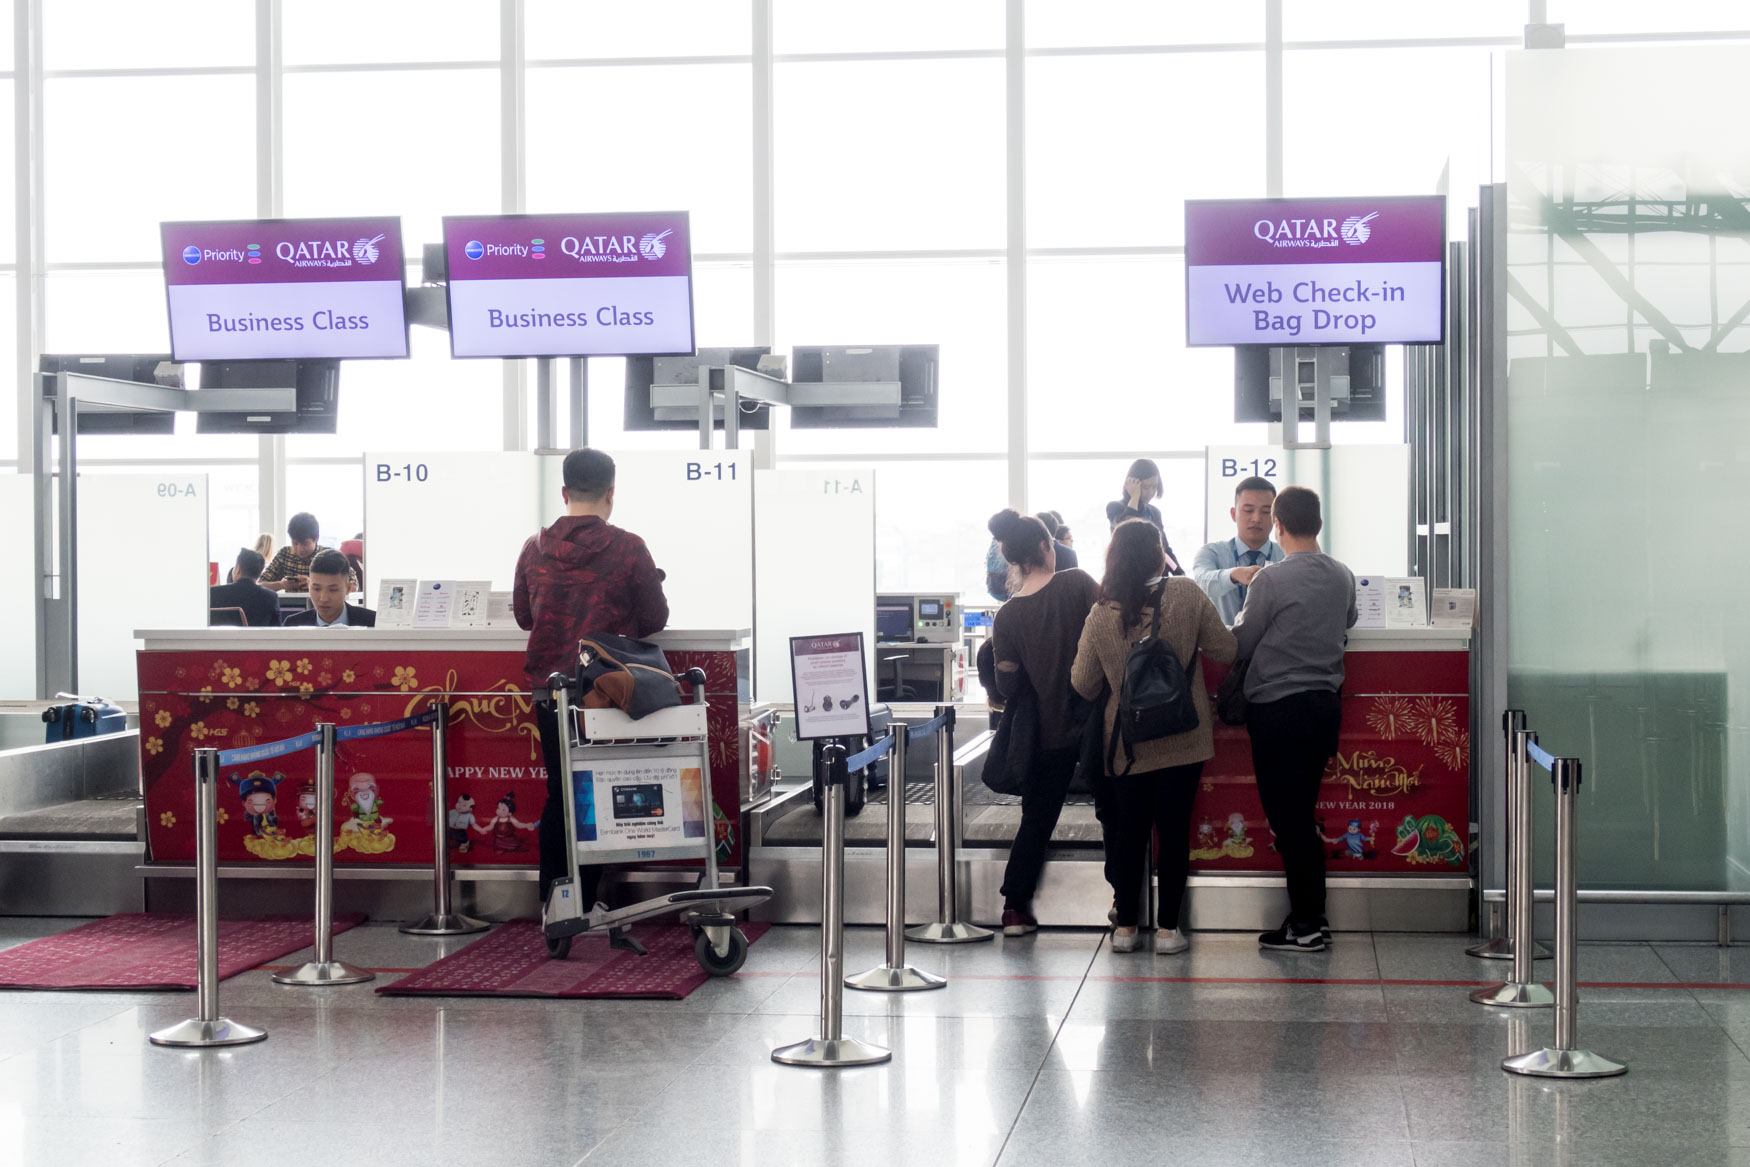 Qatar Airways Check-in at Hanoi Noi Bai Airport